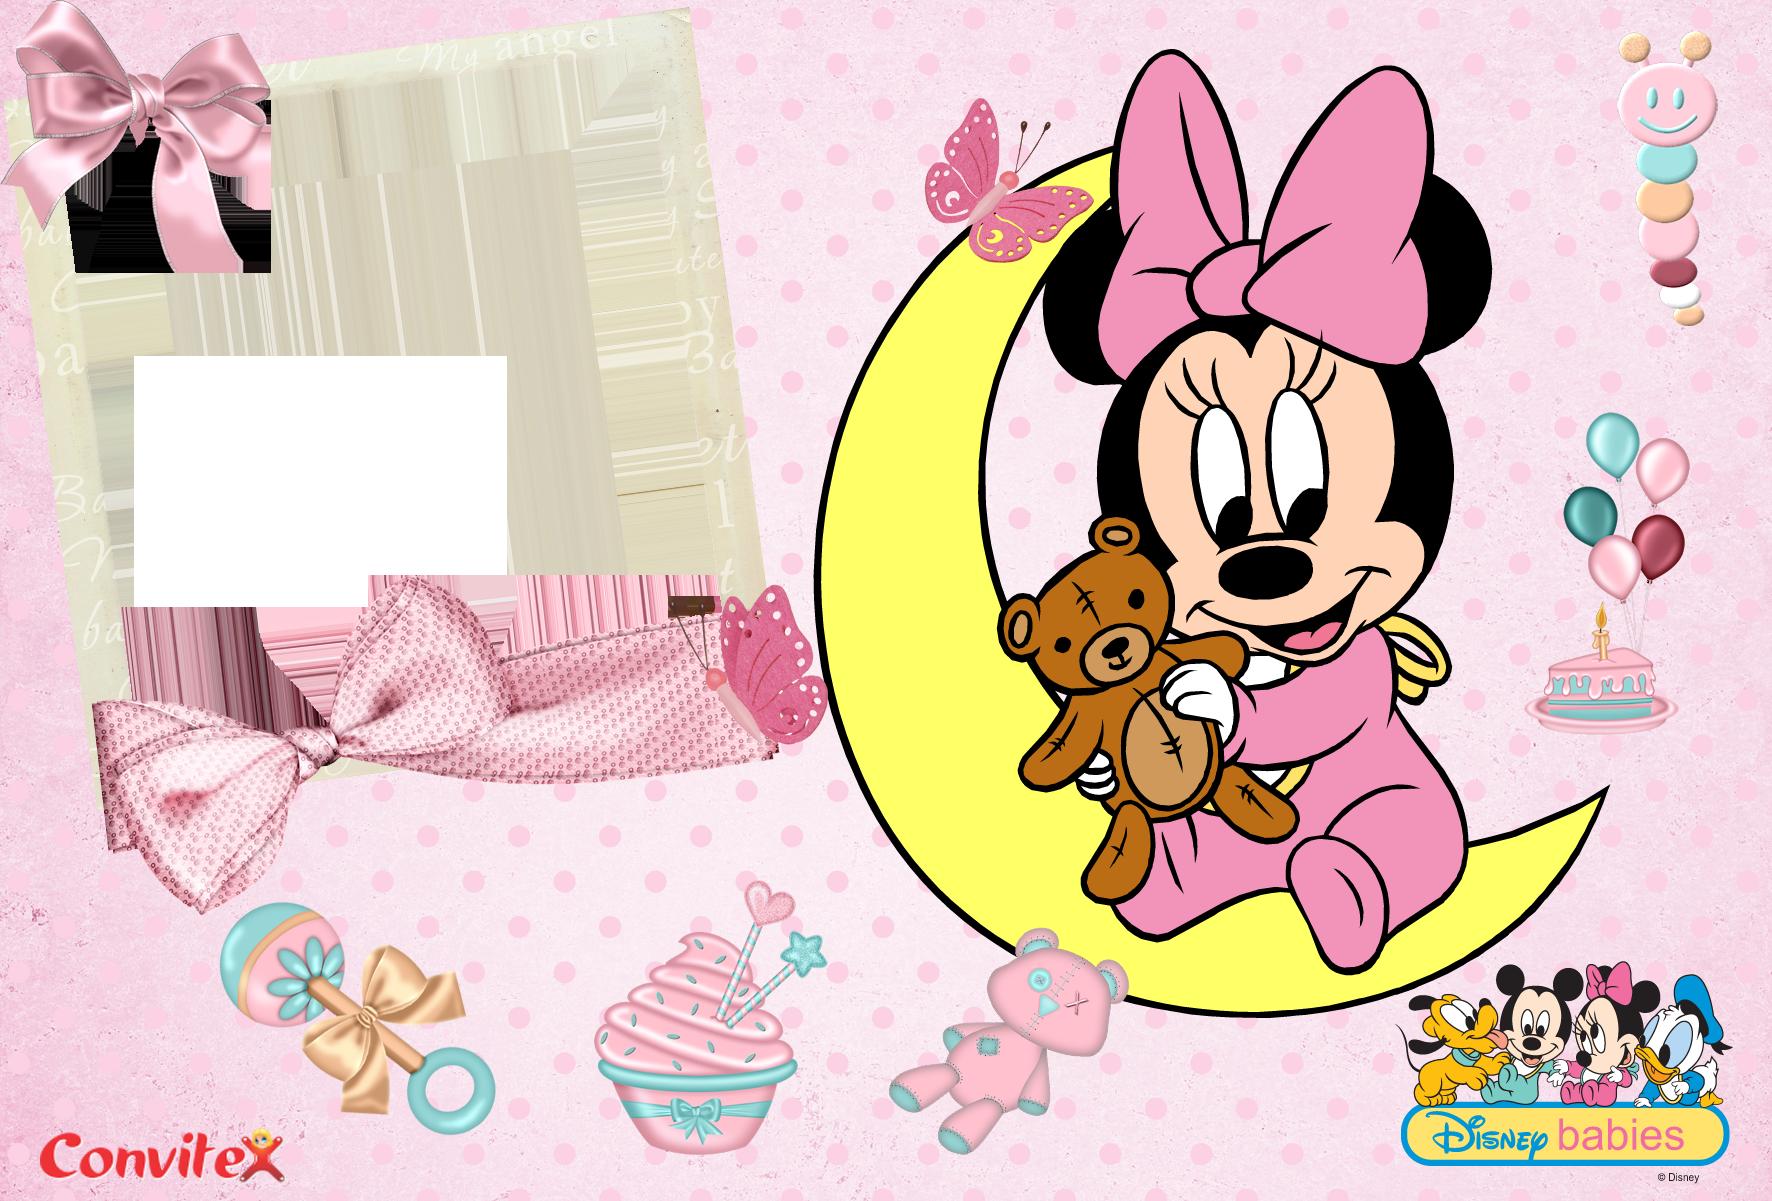 Convite ou Frame Babie Disney 02 « Convitex